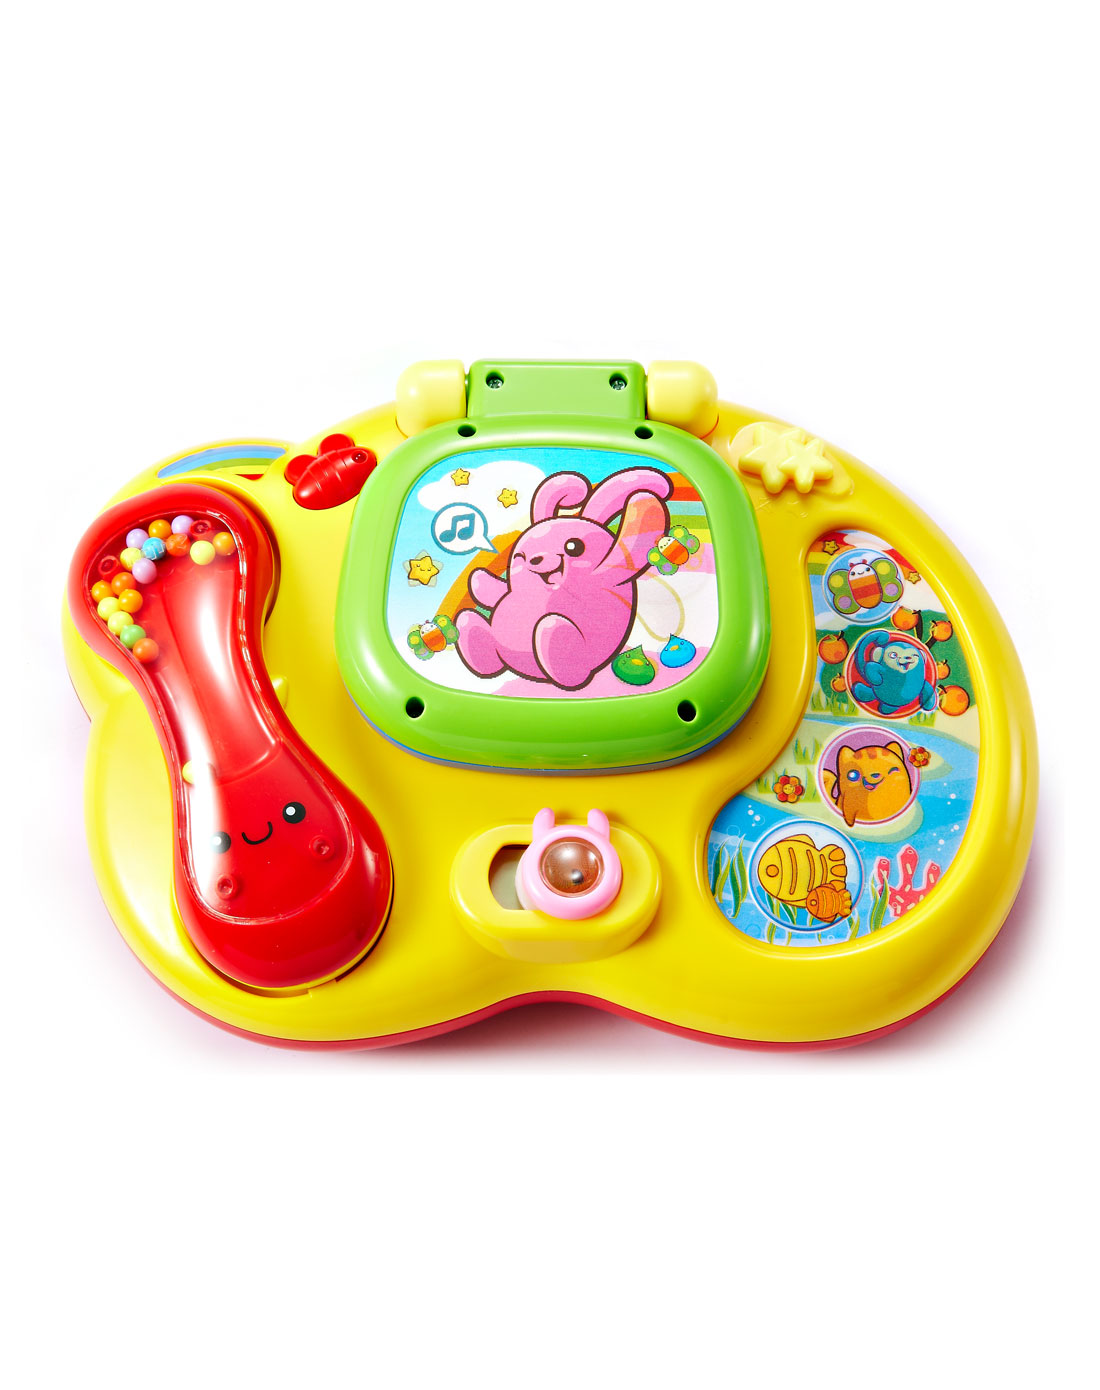 by玩具澳贝玩具